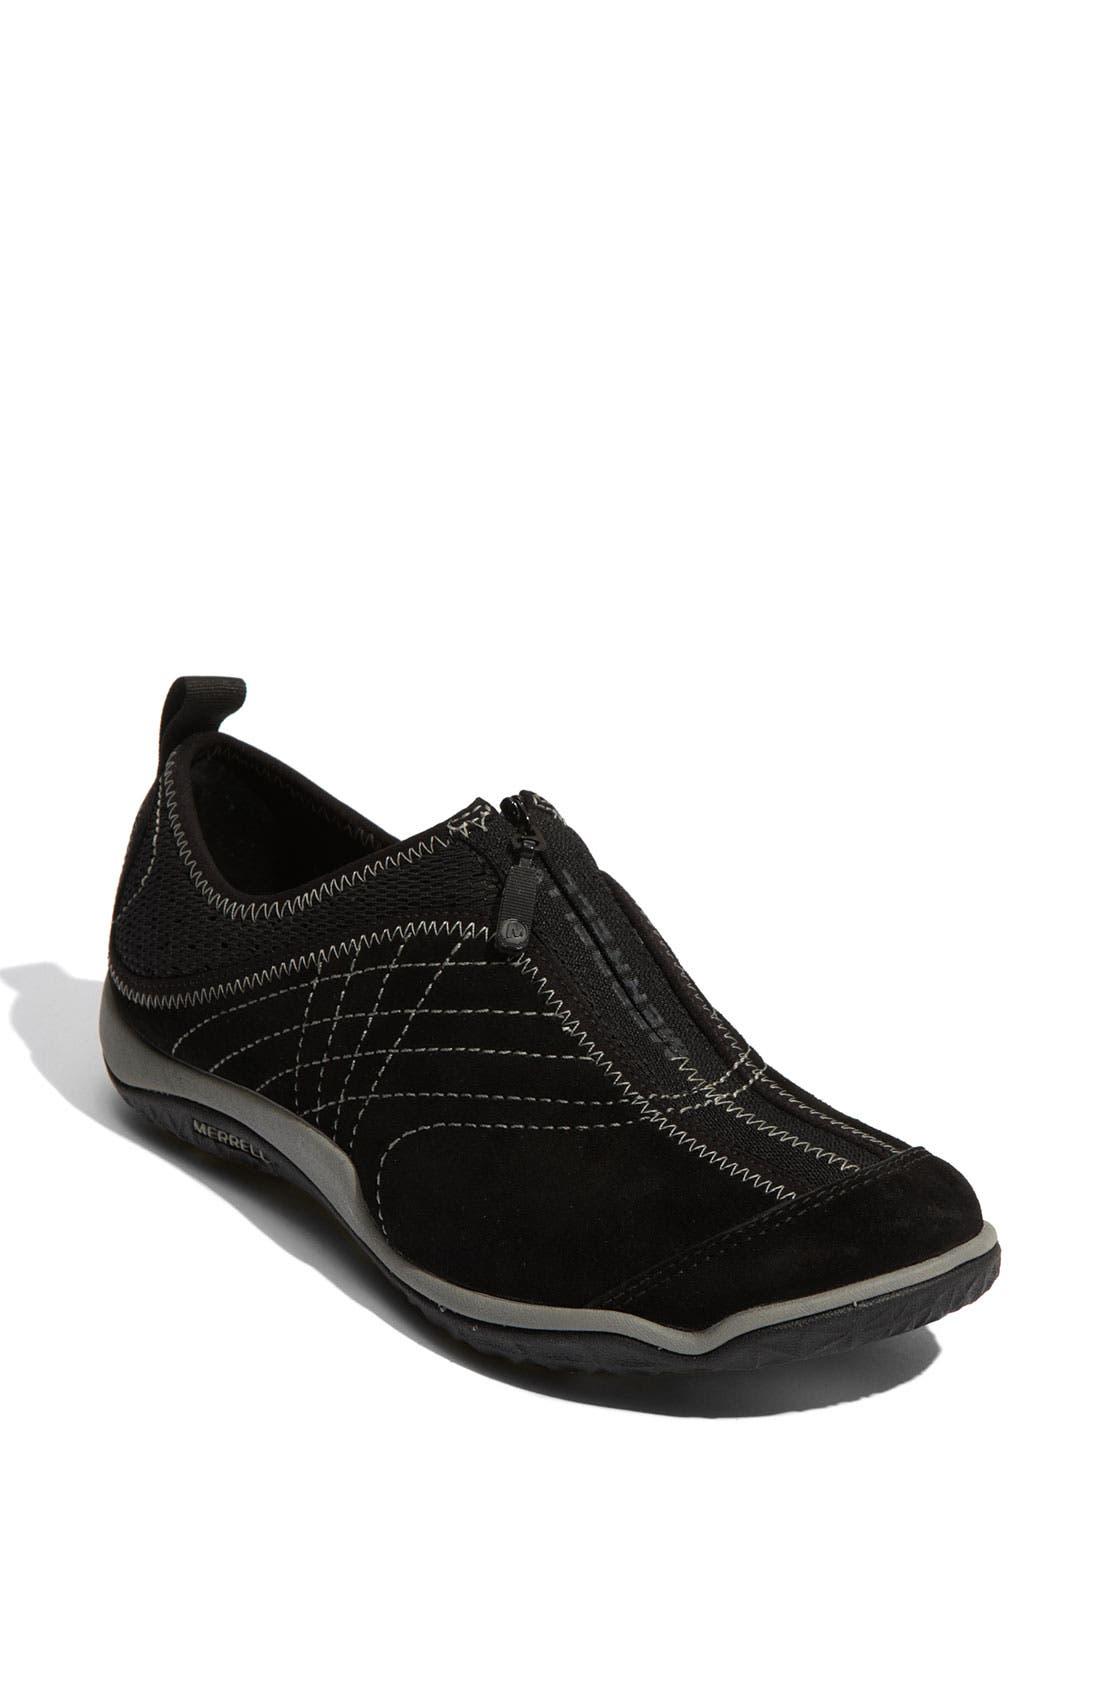 Alternate Image 1 Selected - Merrell 'Lorelei Zip' Sneaker